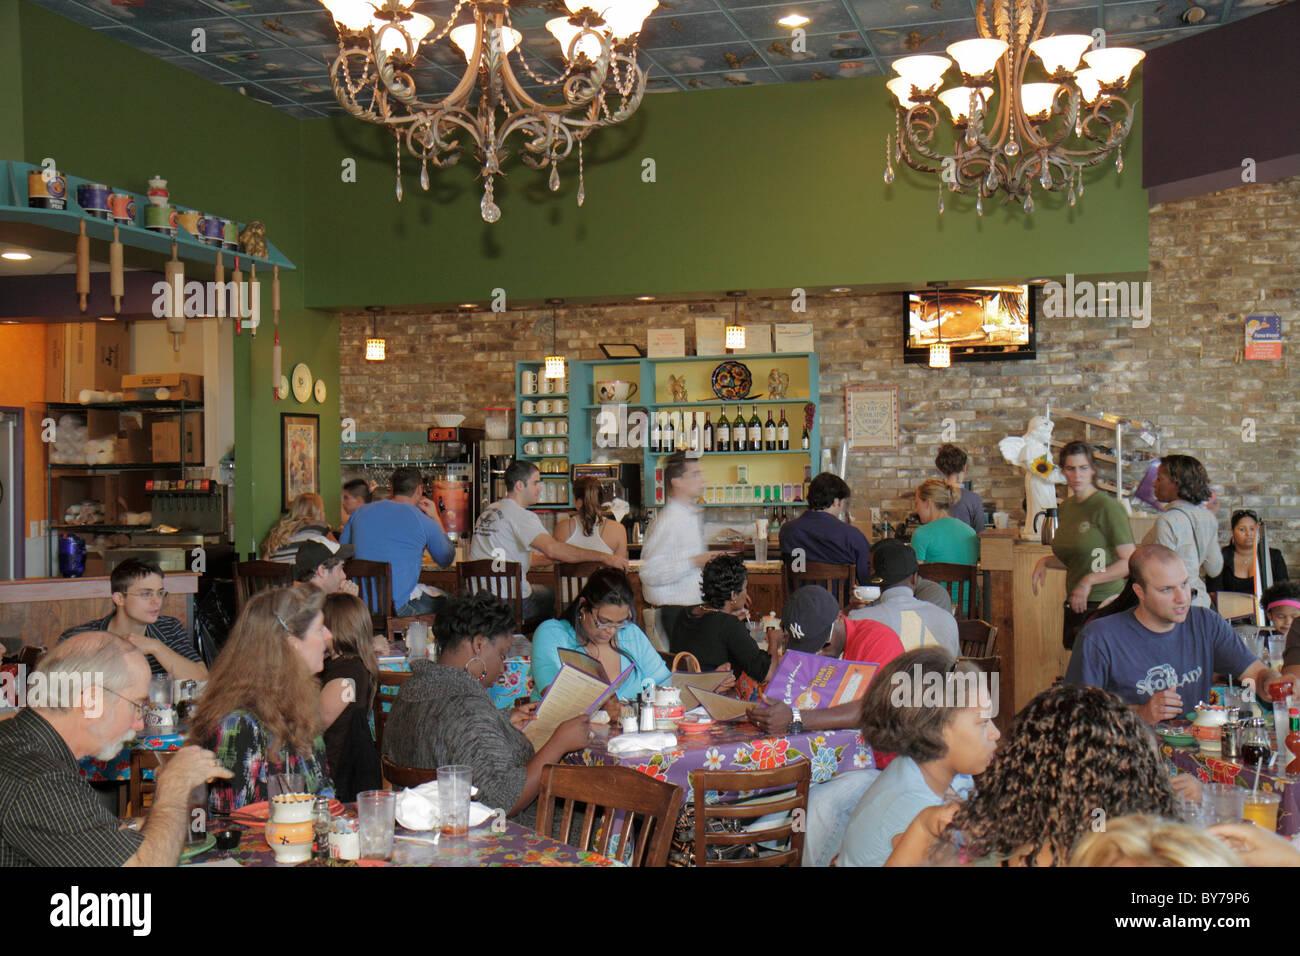 Atlanta Georgia Buckhead Peachtree Street Terminus Flying Biscuit Cafe  Restaurant Business Casual Dining Black Woman Man Patron